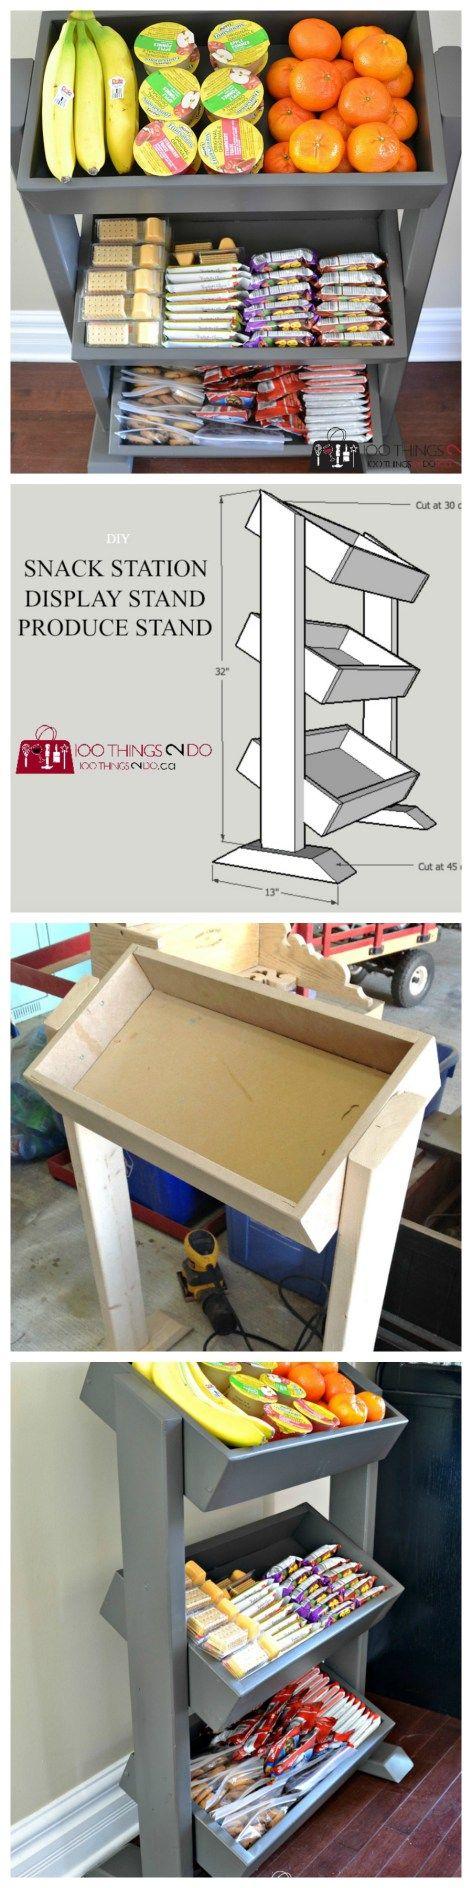 DIY Snack Station - DIY Produce Stand - DIY Display Stand